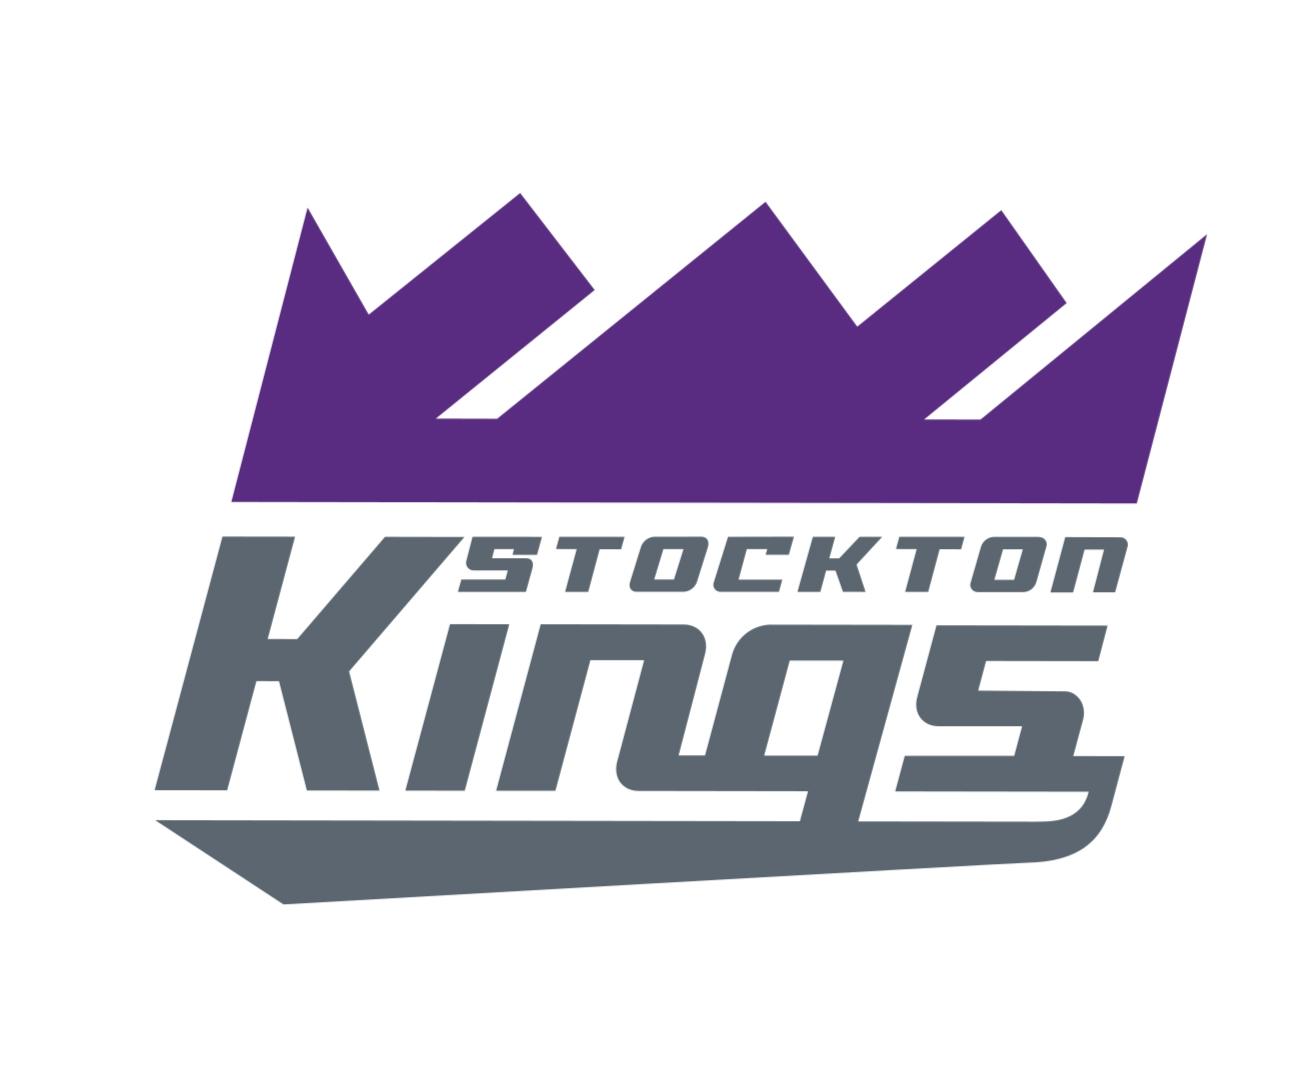 1200px-Stockton_Kings_logo.jpg